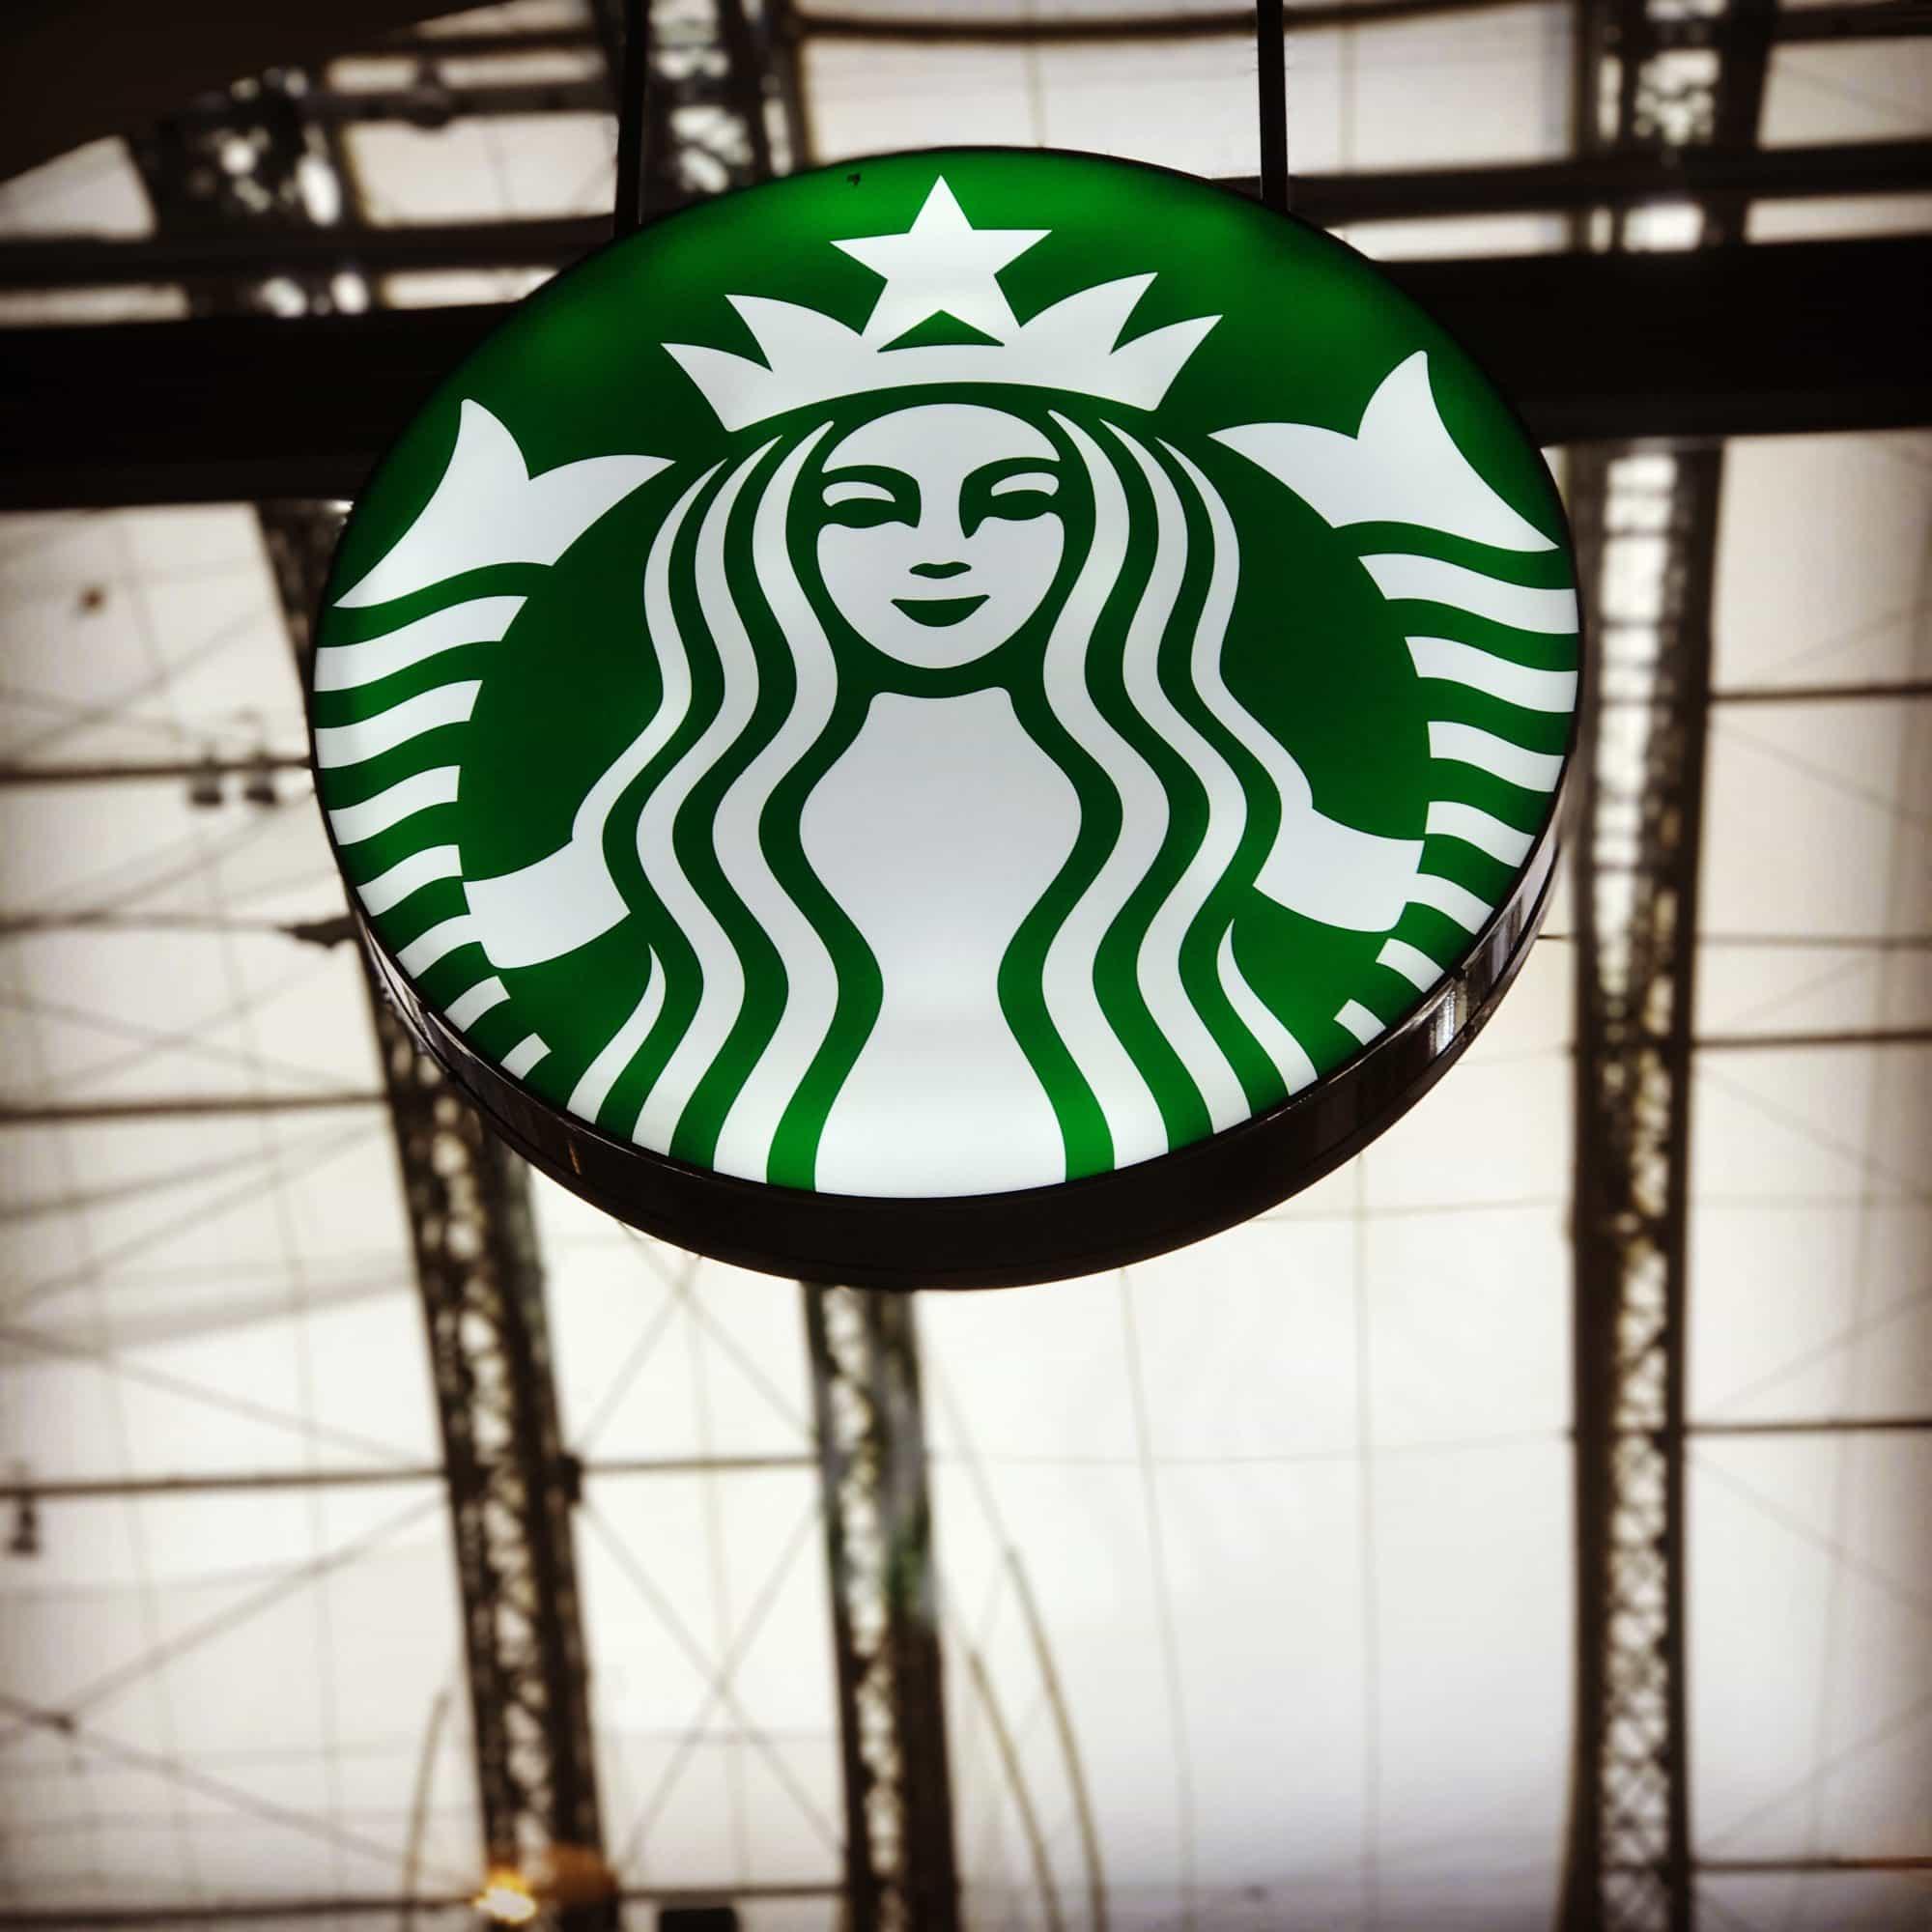 Starbucks Dresden Hauptbahnhof Bokeh Effekt mit iPhone 7 plus